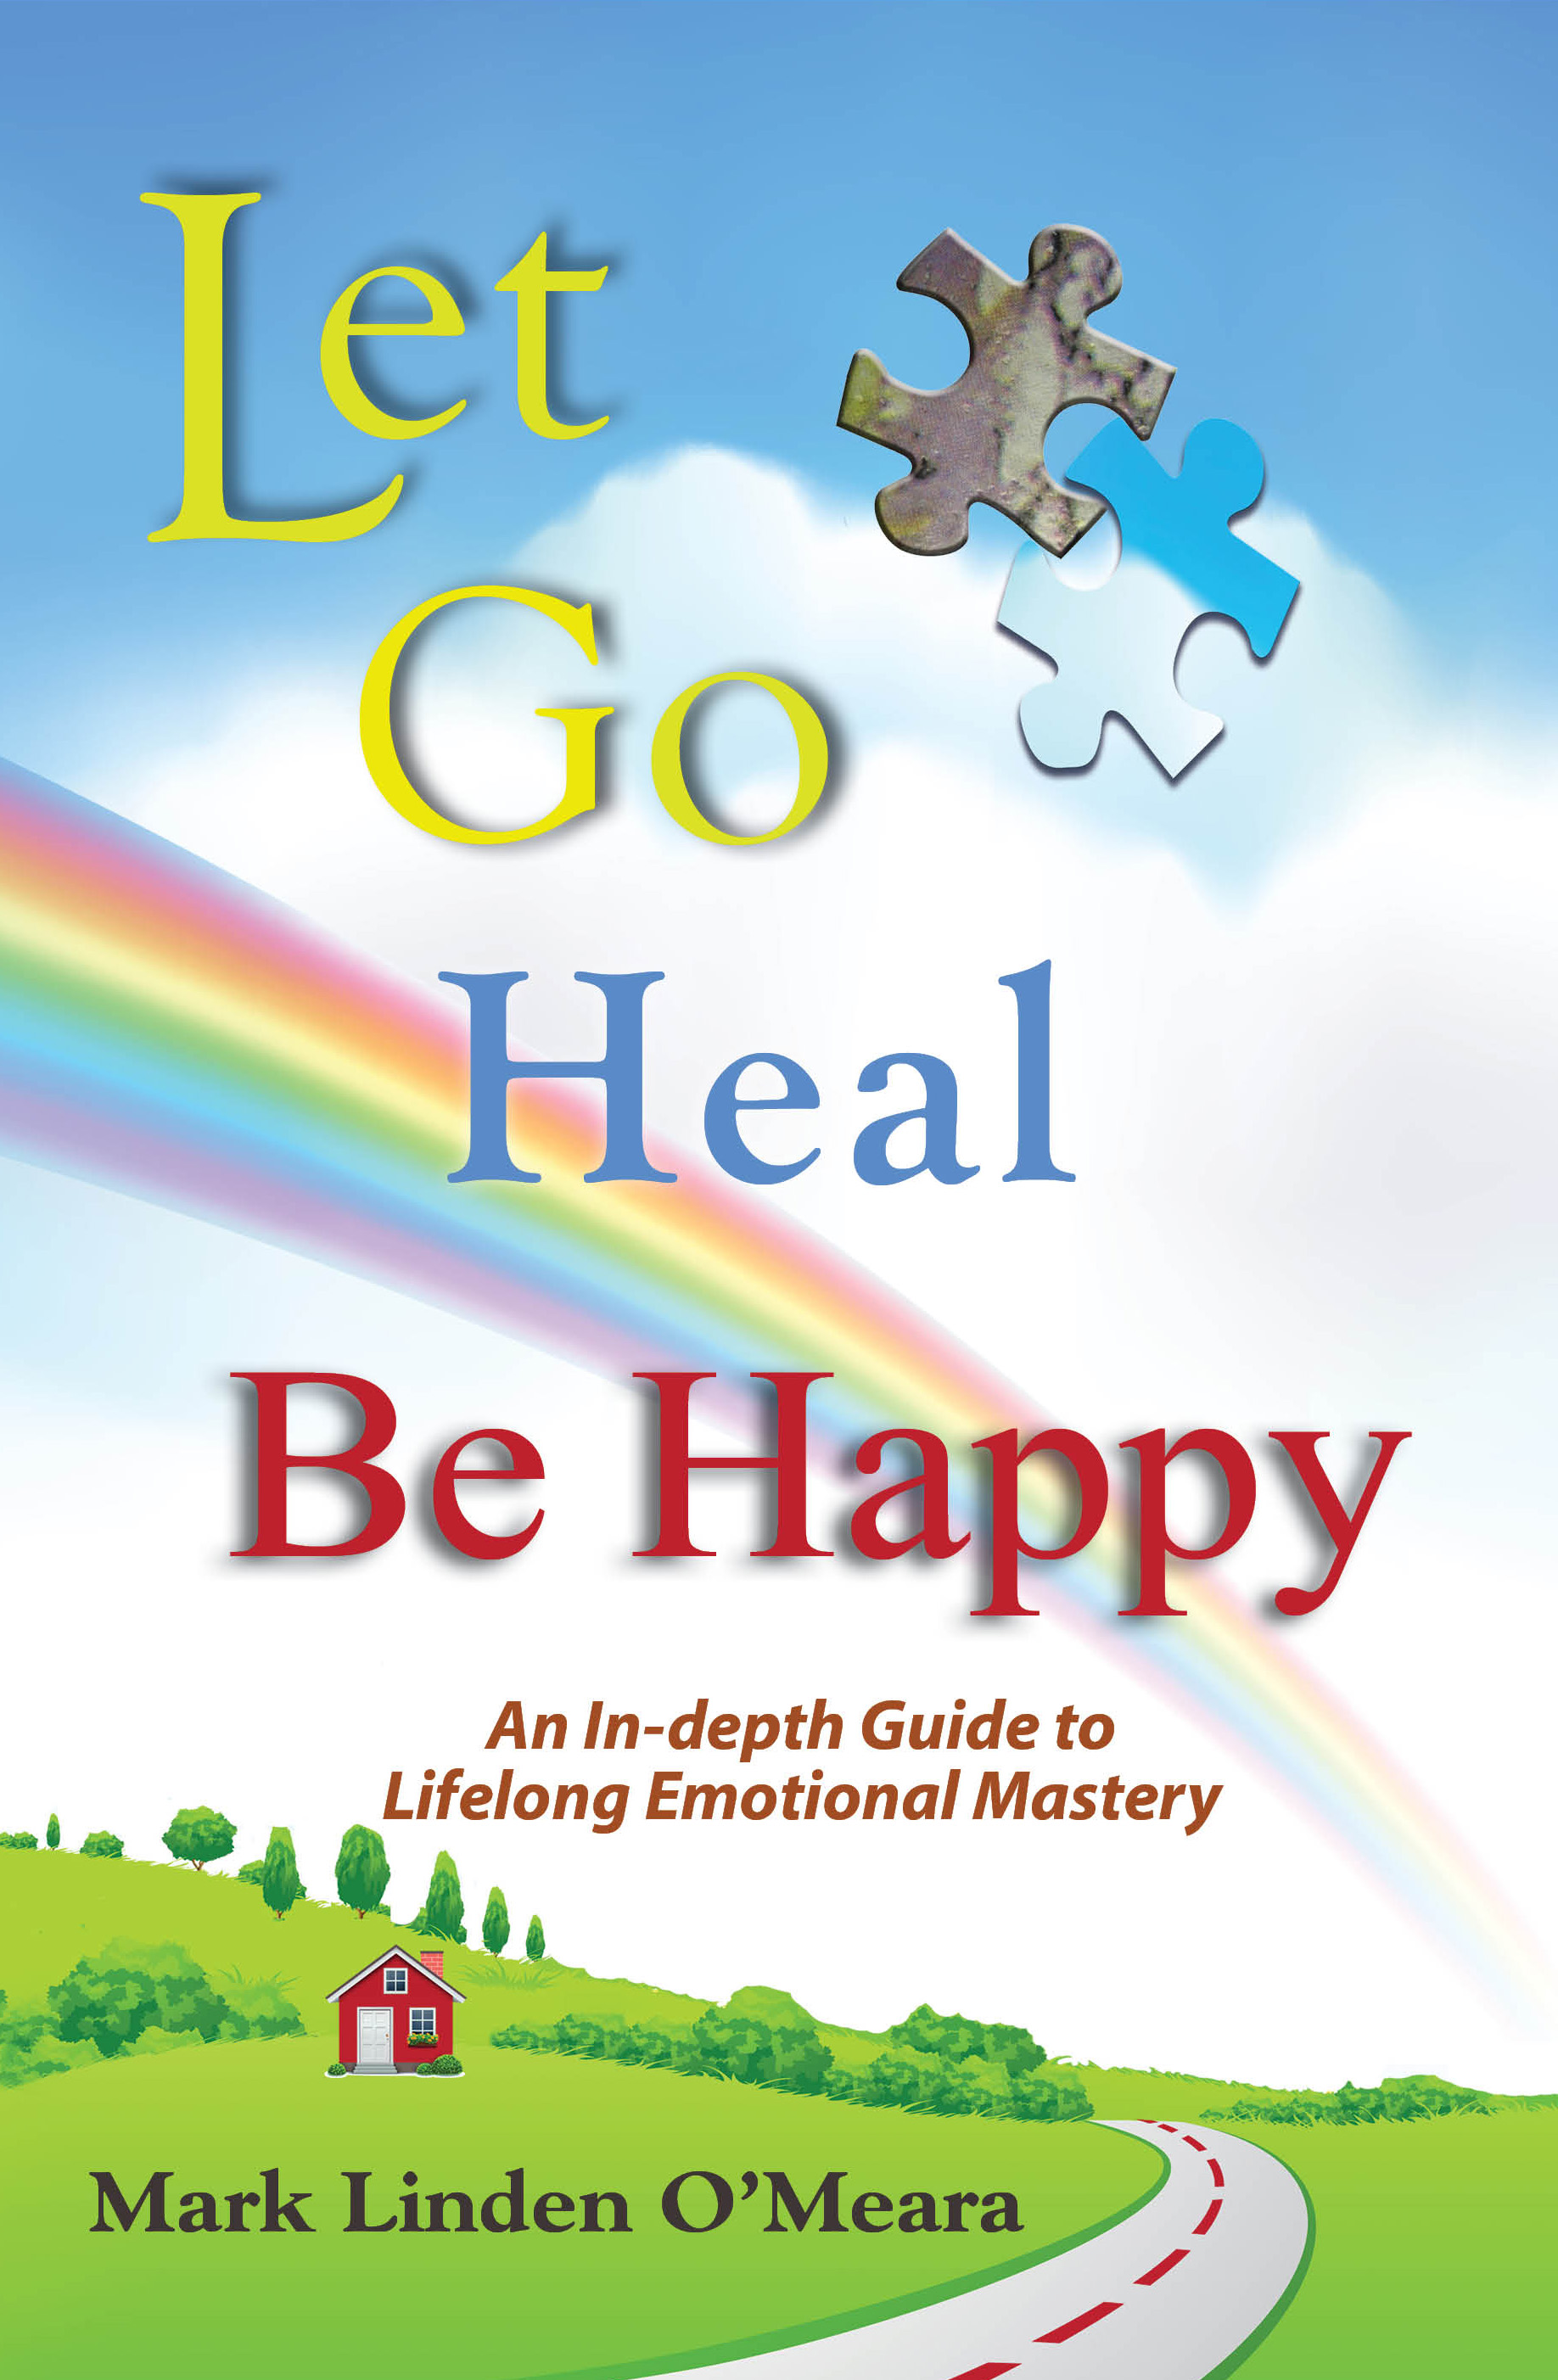 Let Go, Heal, Be Happy